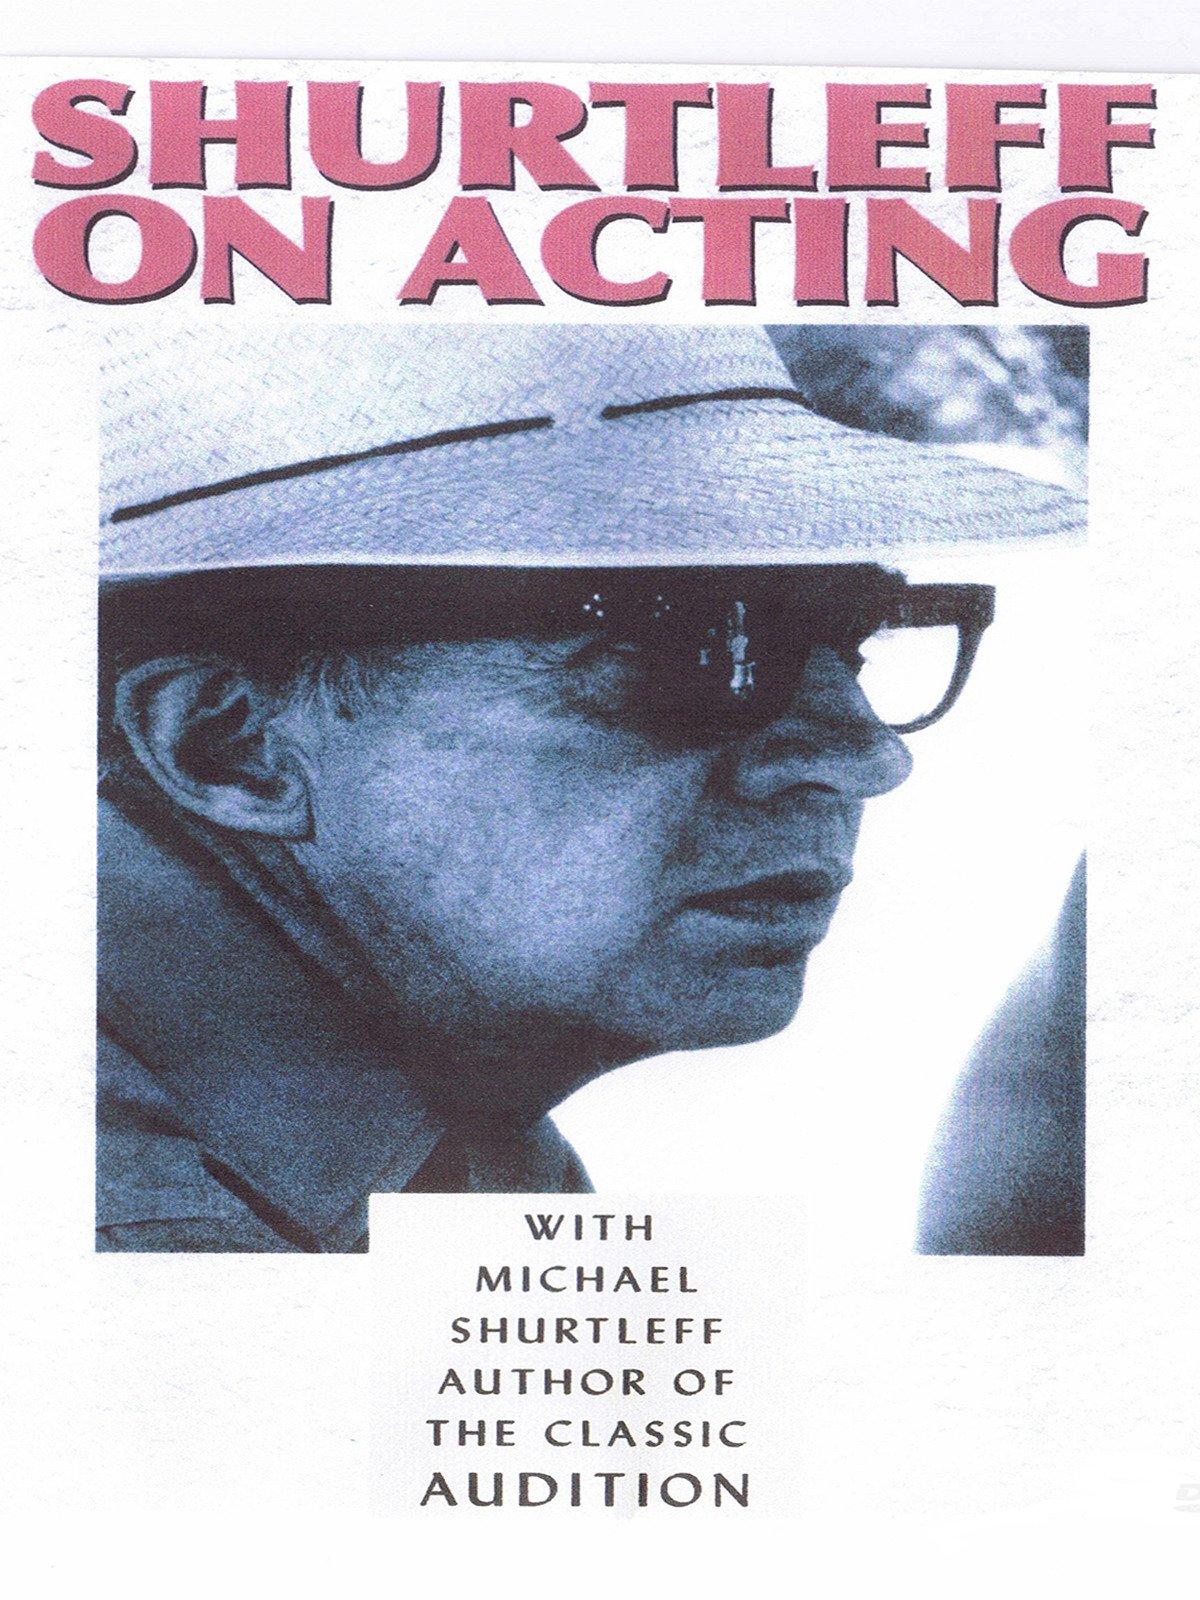 Shurtleff On Acting on Amazon Prime Instant Video UK